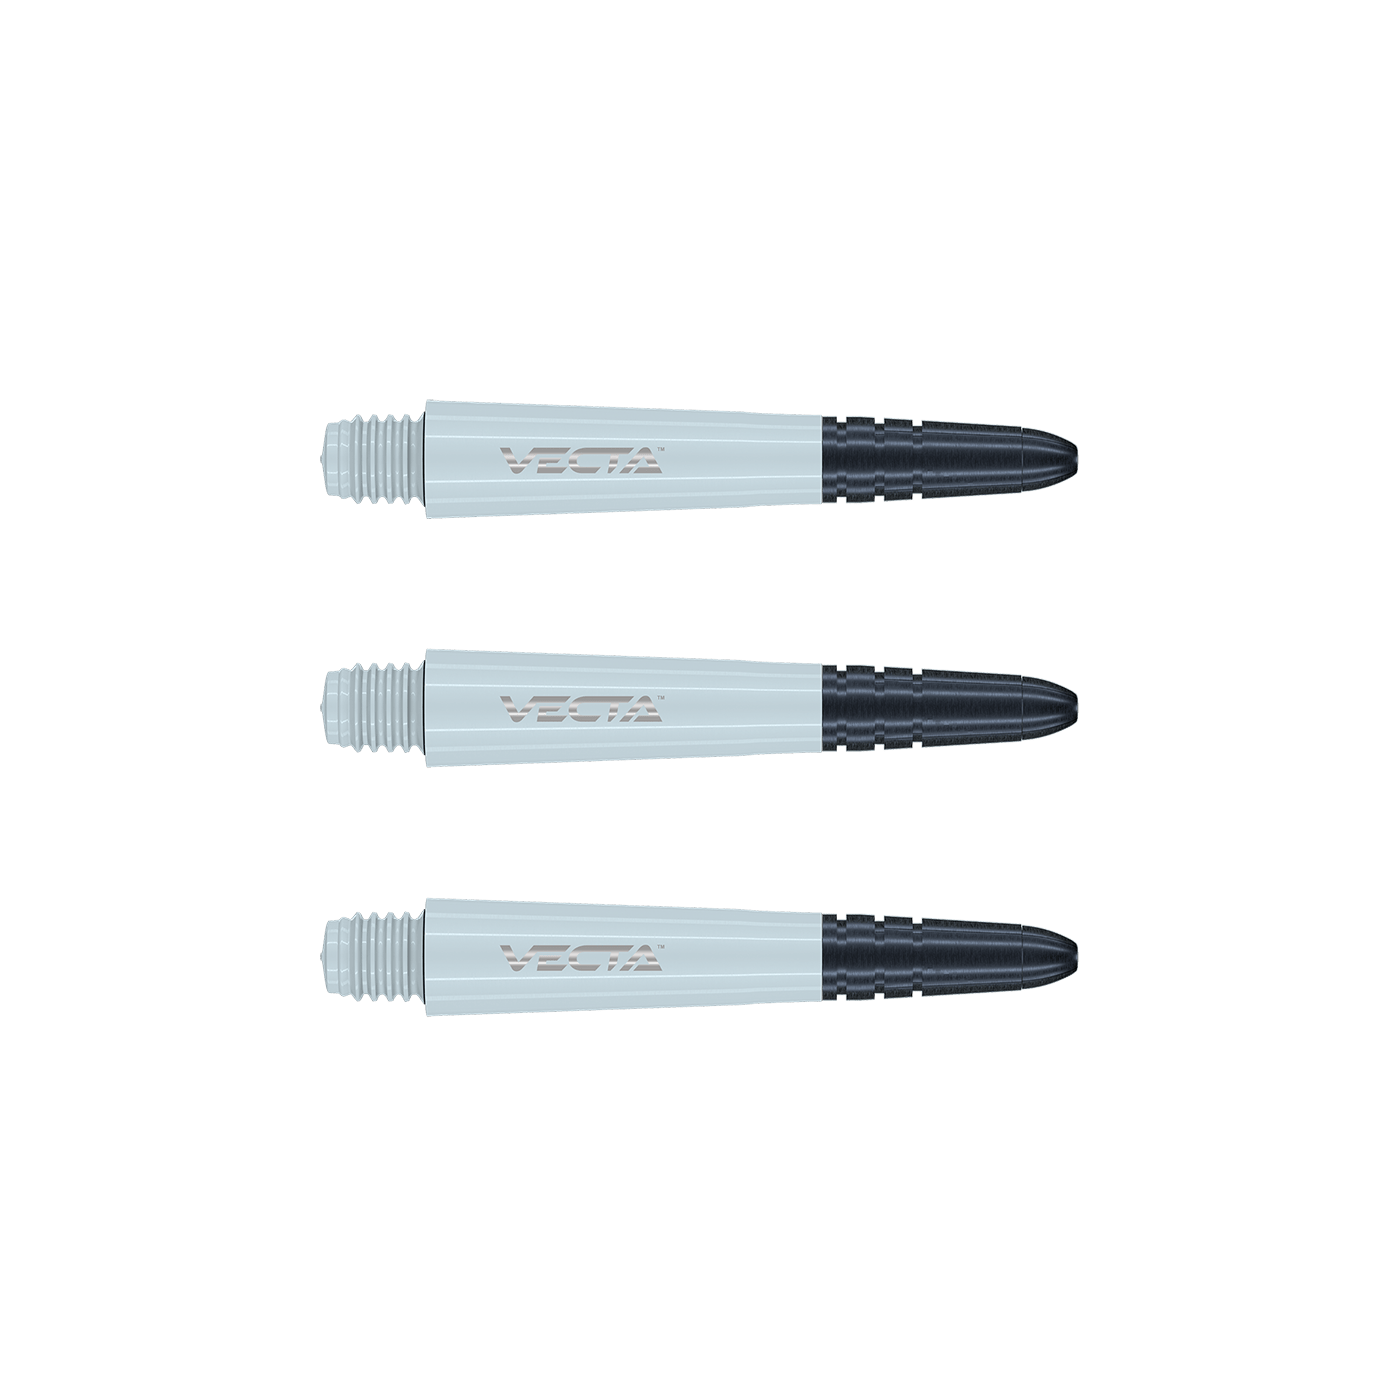 Winmau Vecta Darts Stems Polycarbonate 35mm SHORT White